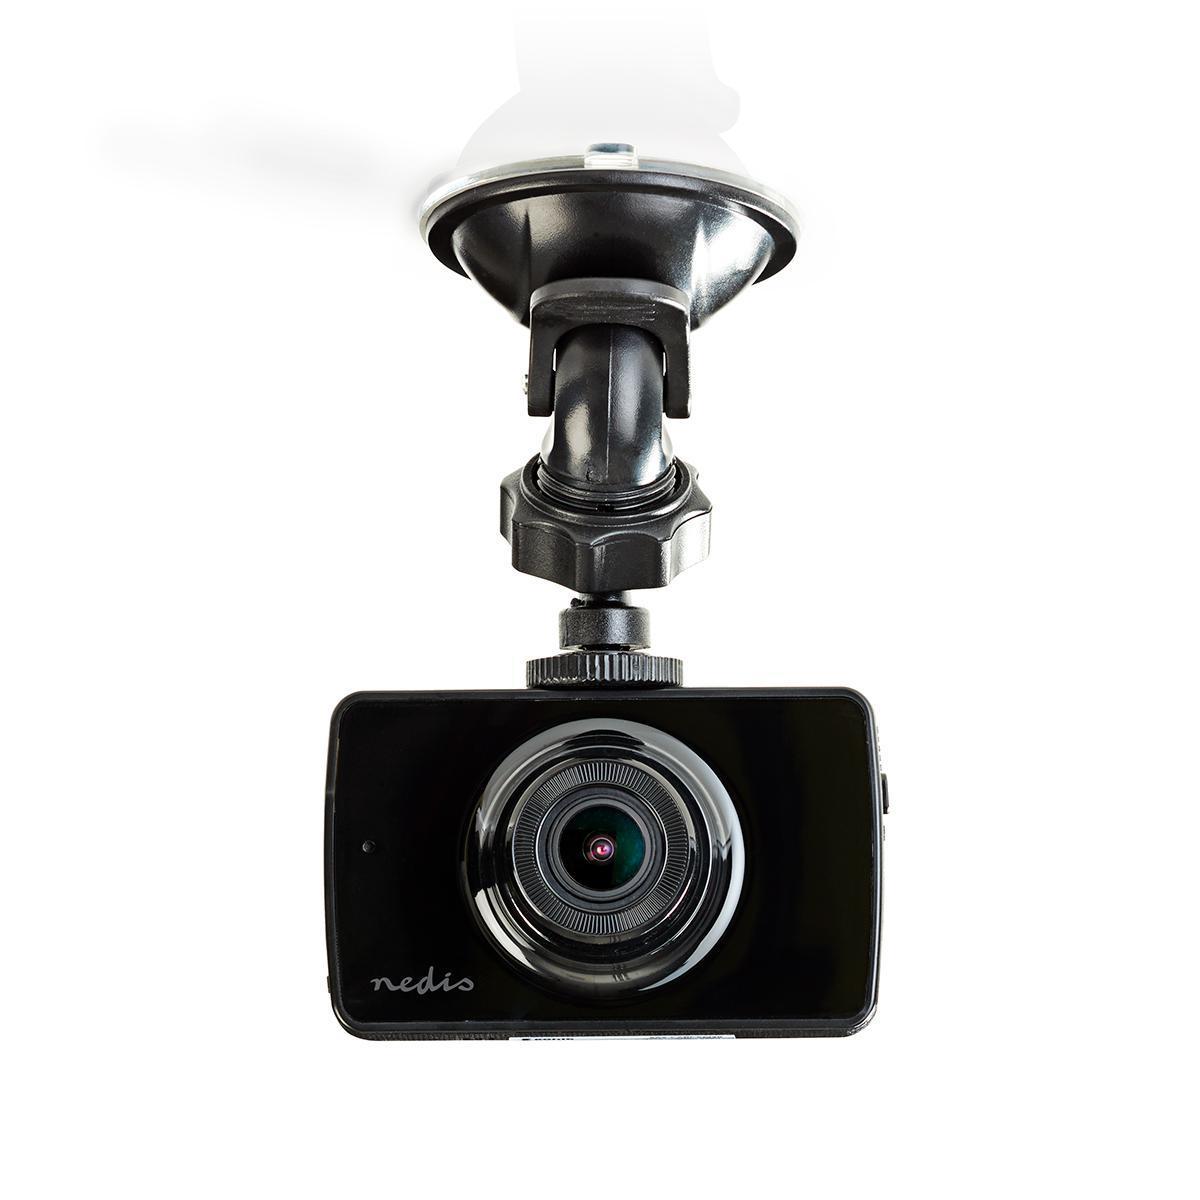 Sinji Dashcam Full HD 1080p - Maak Verkeersopnames Als ...   1200x1200